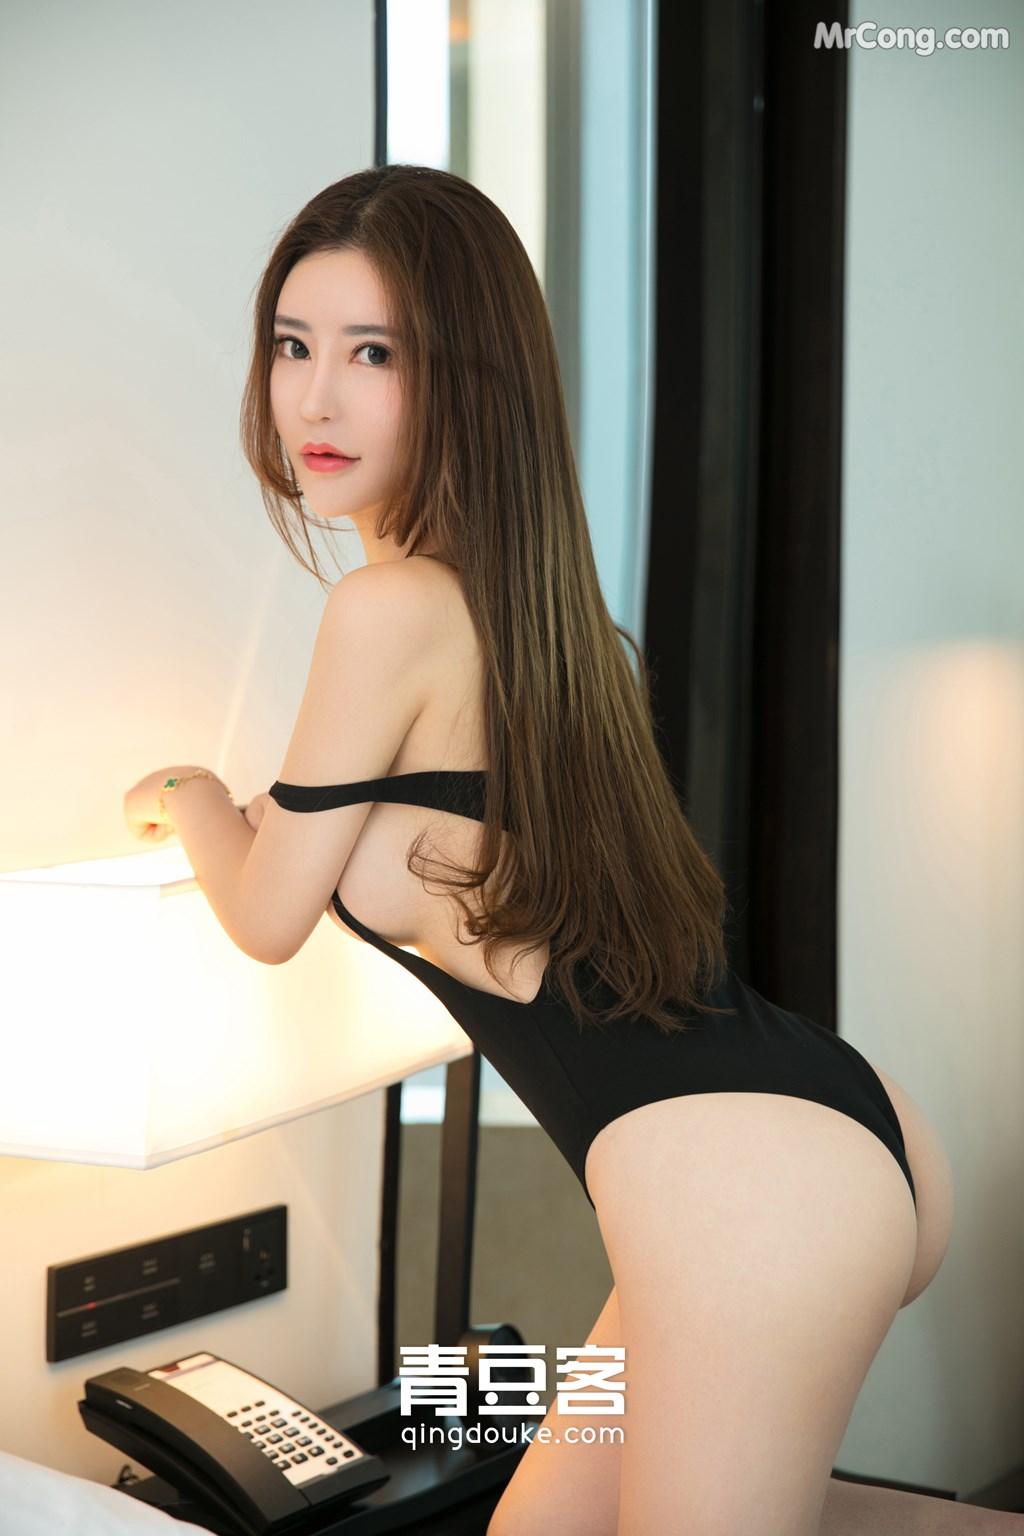 Image QingDouKe-2017-11-12-Tong-Man-MrCong.com-003 in post QingDouKe 2017-11-12: Người mẫu Tong Man (佟蔓) (50 ảnh)